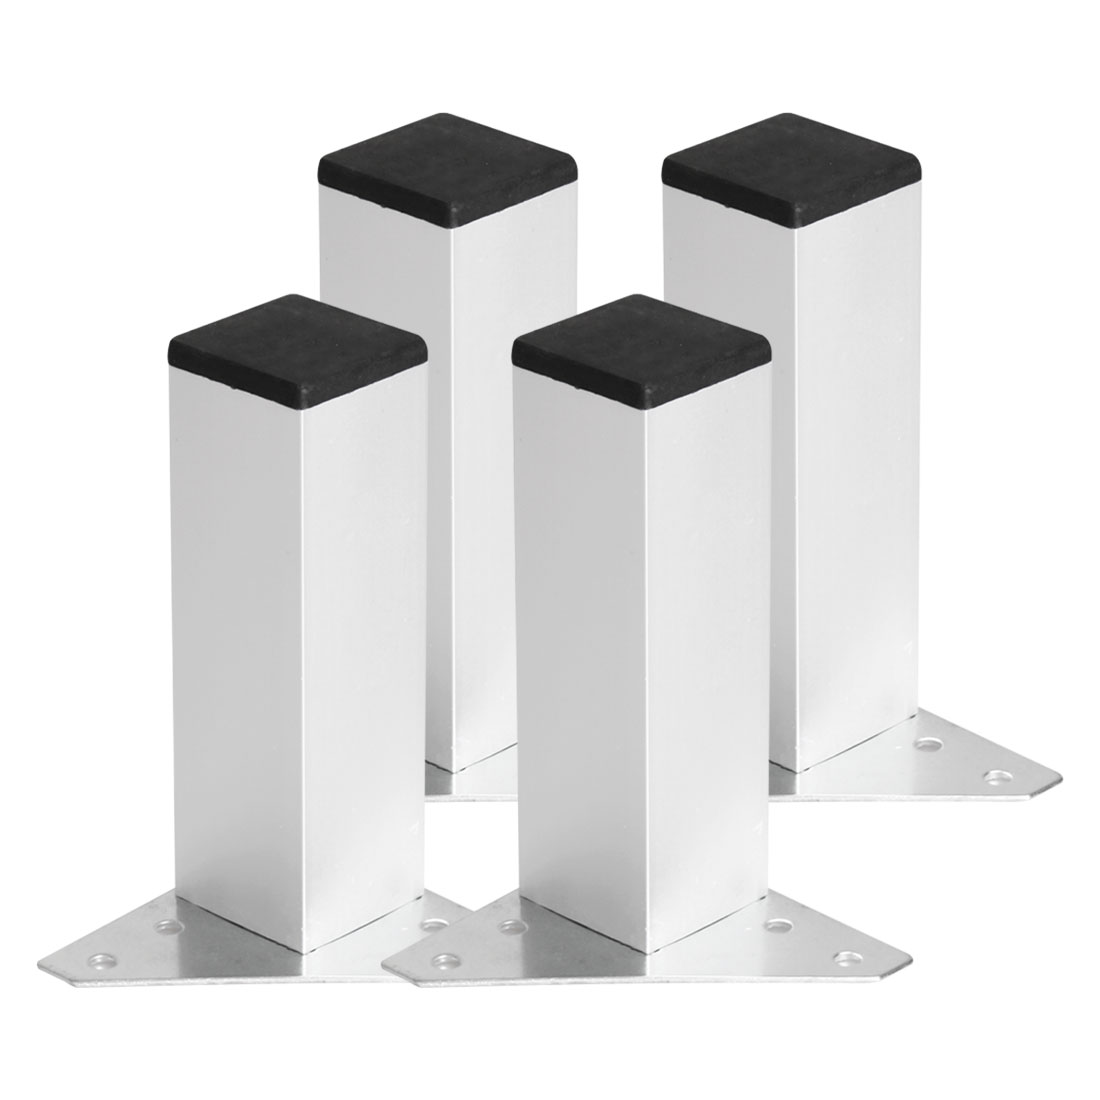 "6"" Furniture Leg Aluminium Alloy Table Feet Replacement Height Adjustment 4pcs"